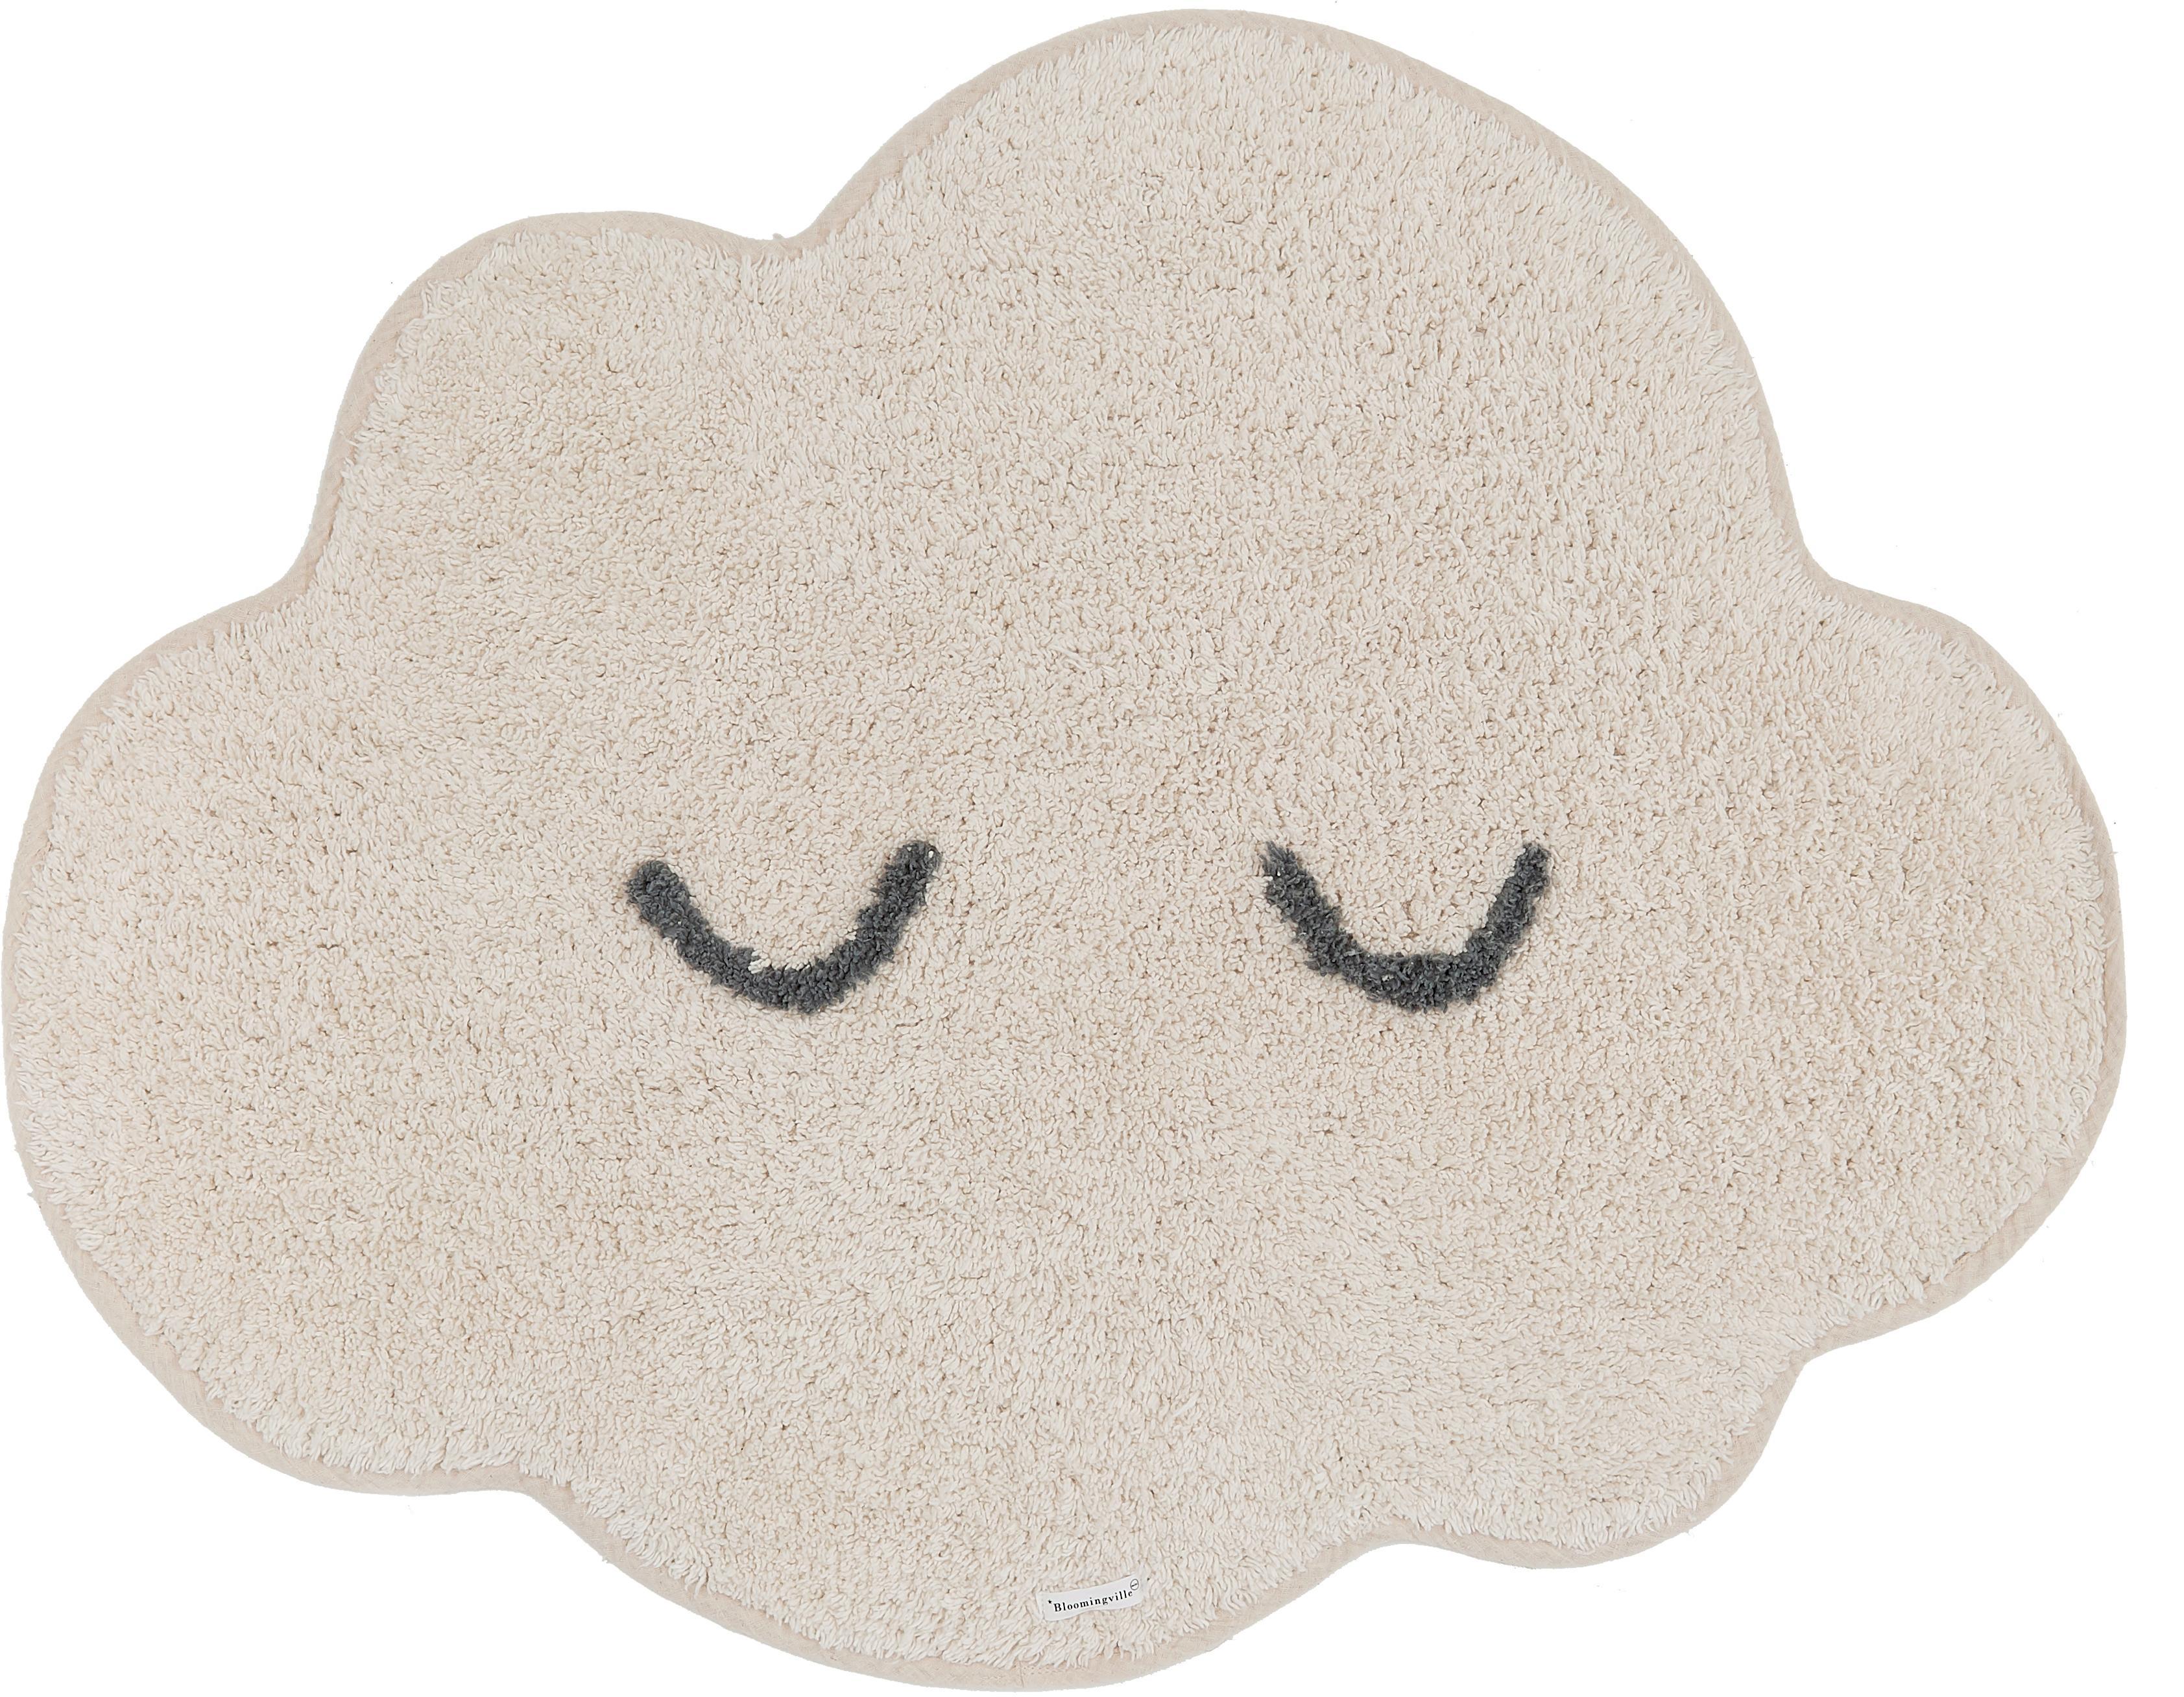 Alfombra de algodón ecológico Cloud, Algodón, Beige, An 57 x L 82 cm